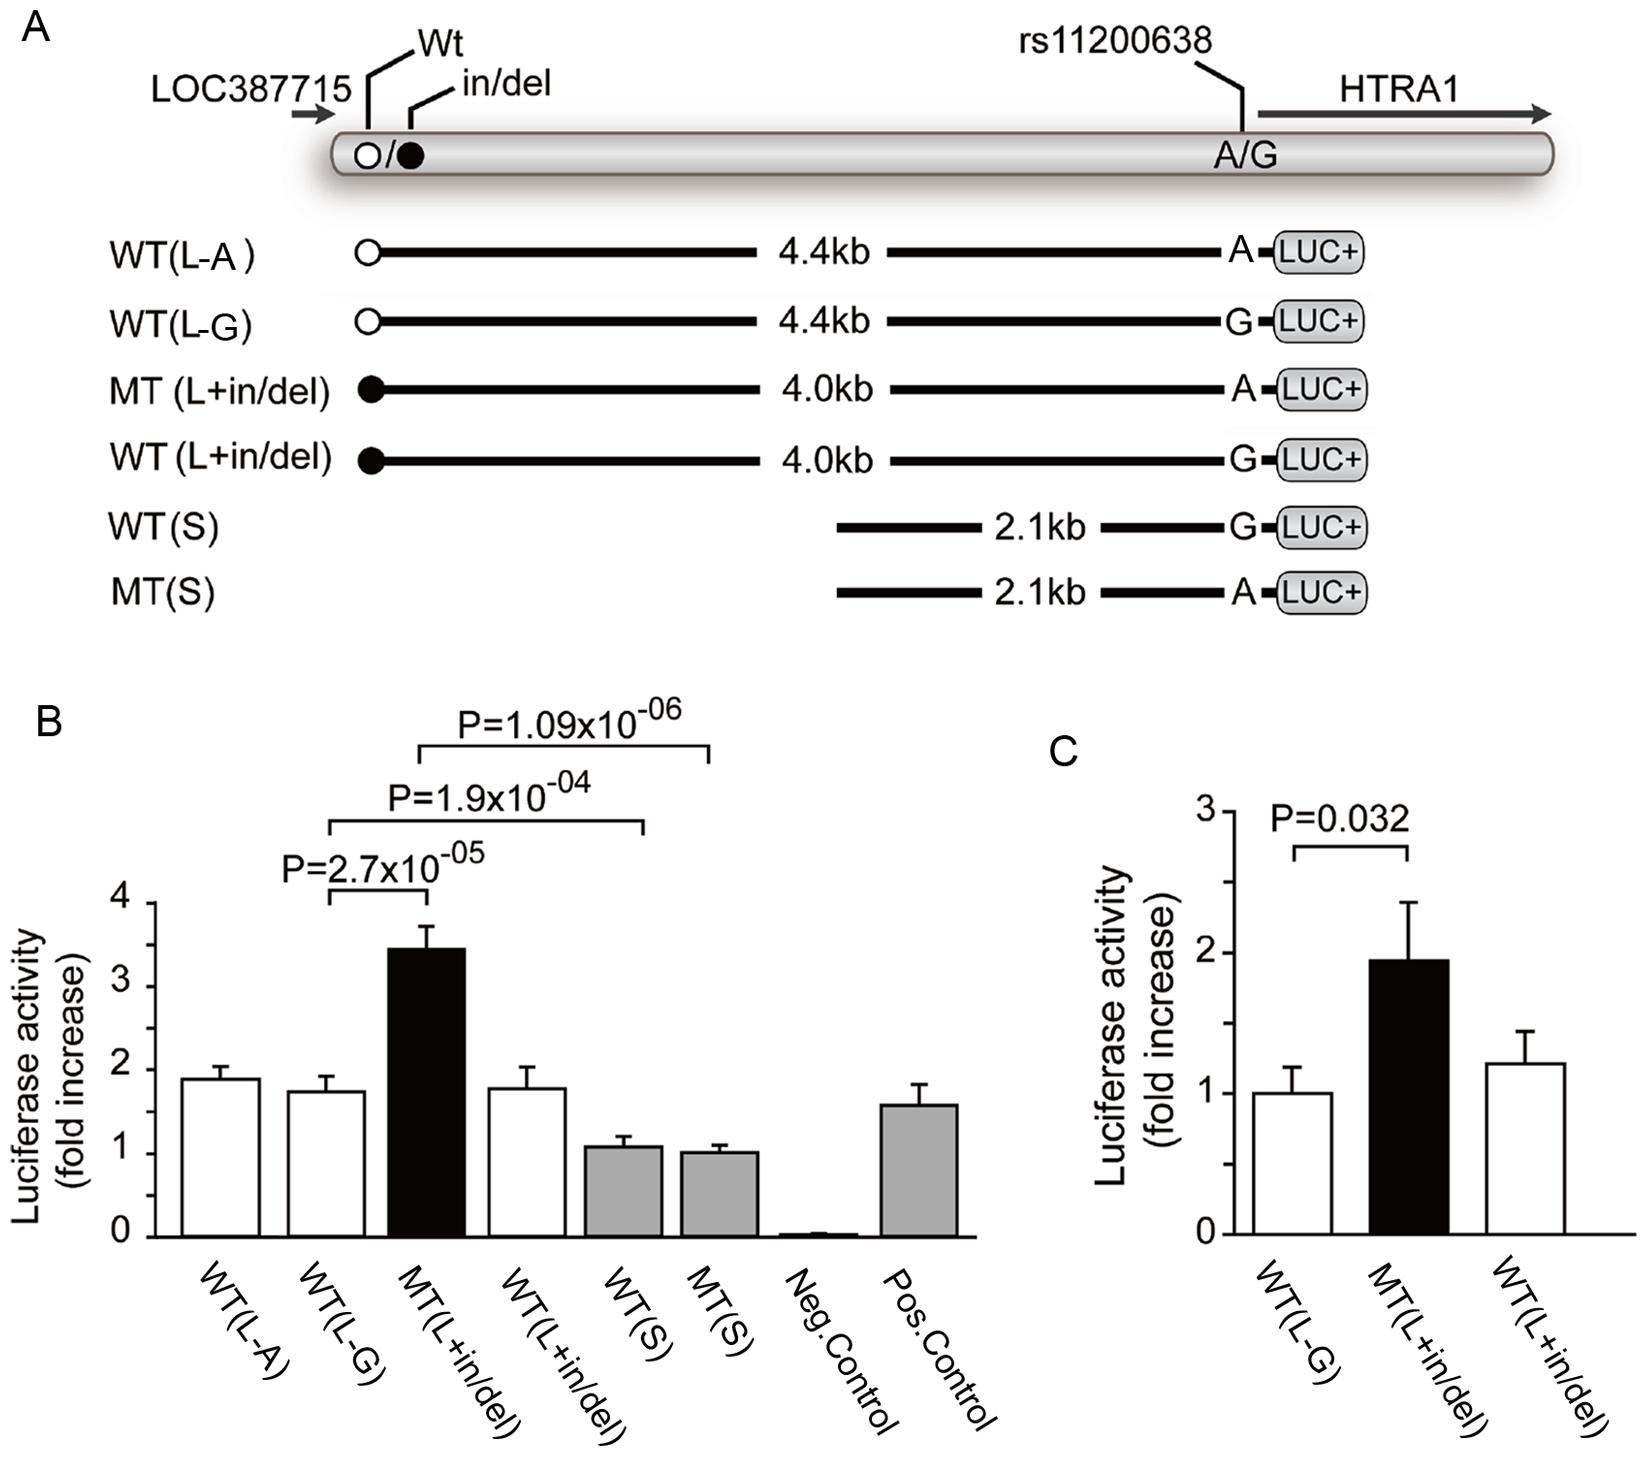 Heterologous Luciferase assays <i>in vitro</i> and <i>in vivo</i>.